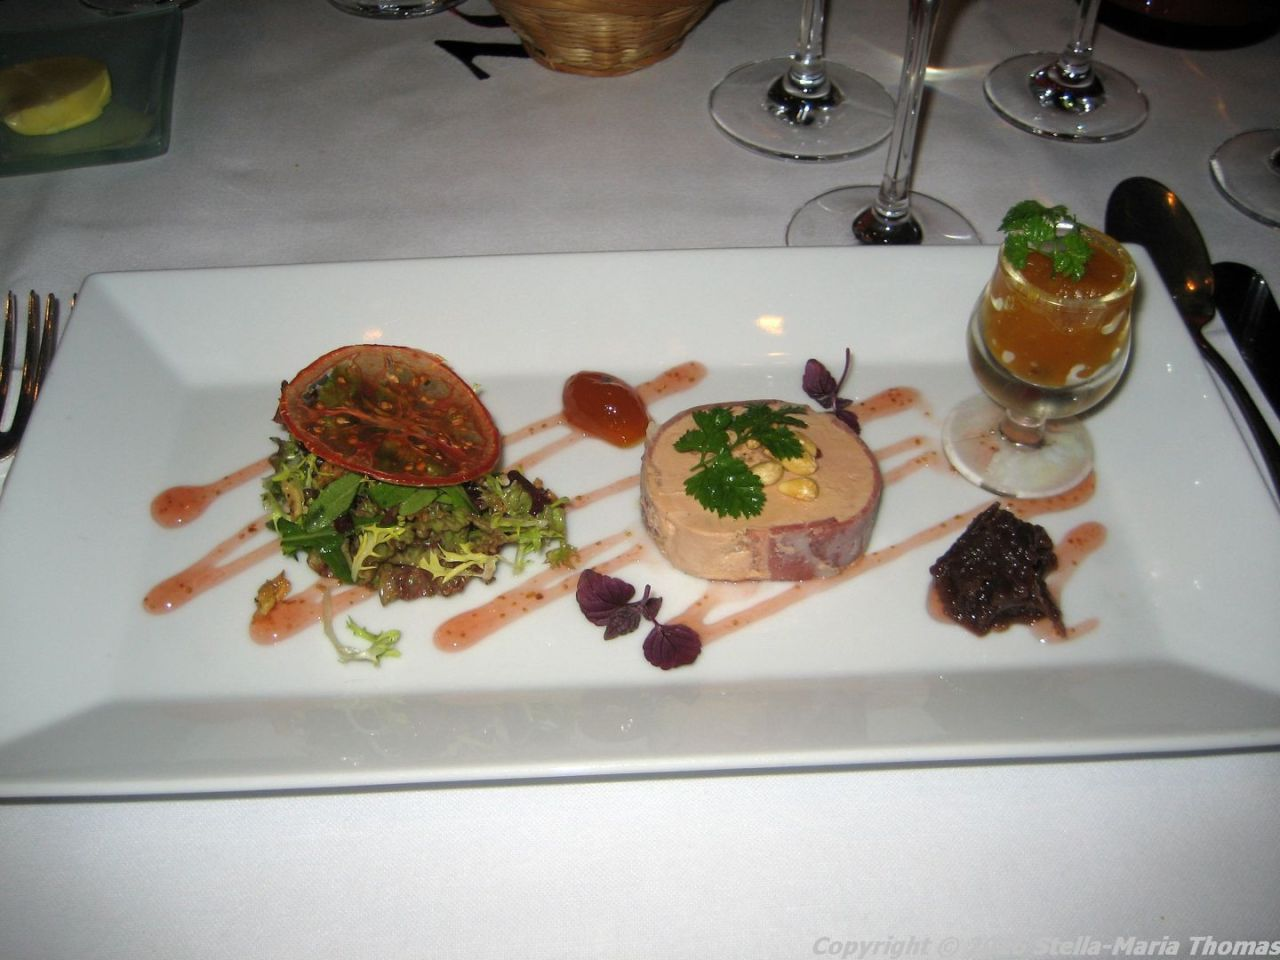 de-florentijnen-foie-gras-doie-pumpkin-chutney-pata-negra-ham-raisin-bread-003_23168965223_o